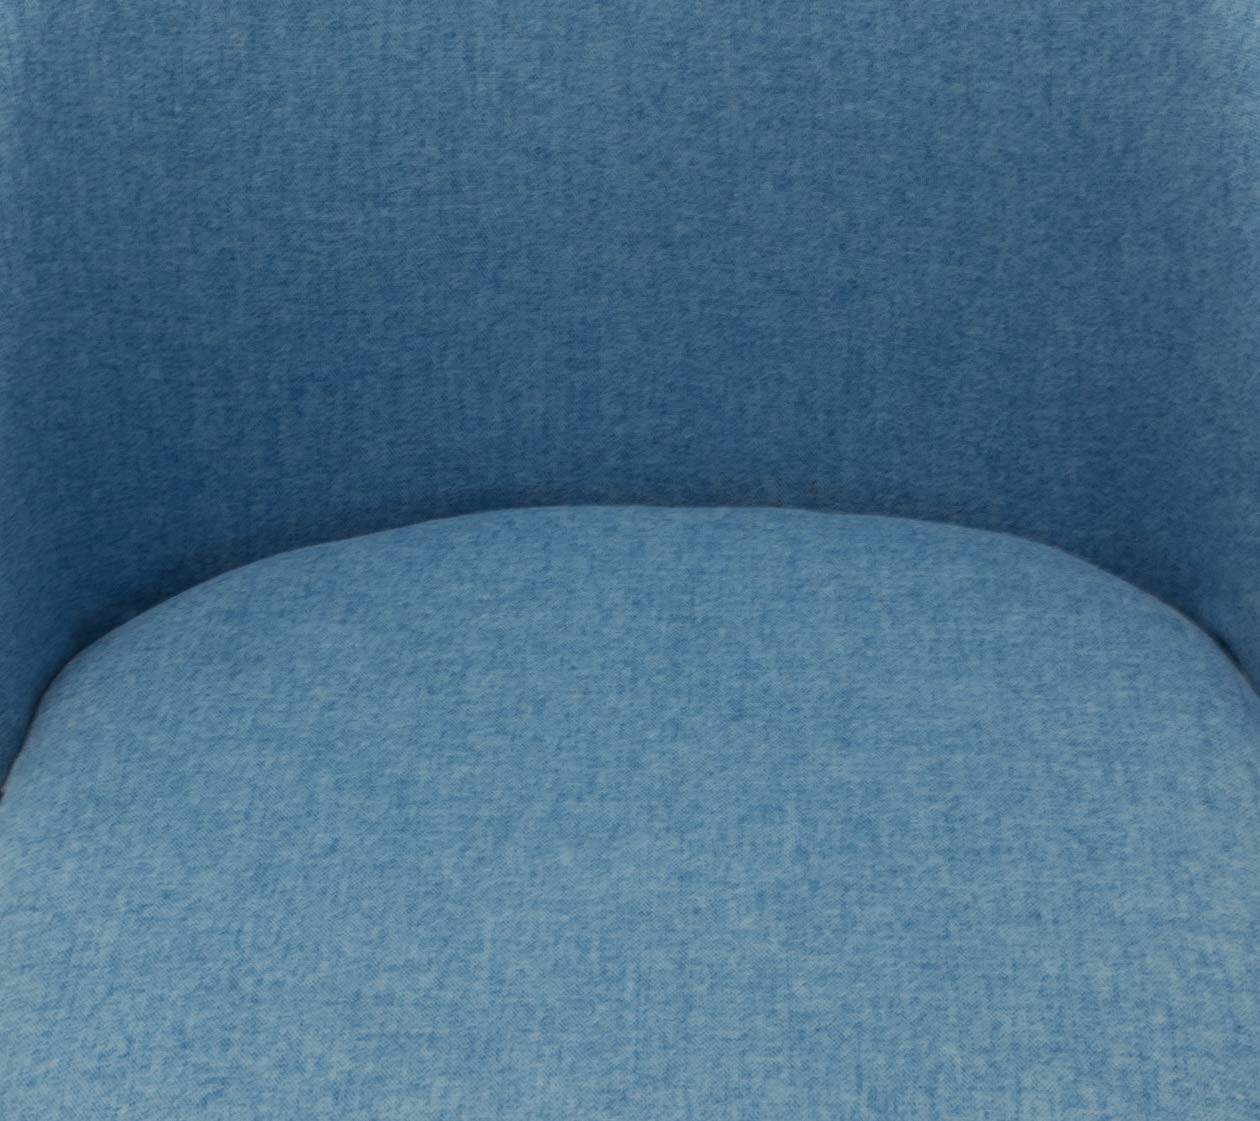 P2 A77007 Set of 2 Bar Stools Blue Fabric Seat /& Metal Legs